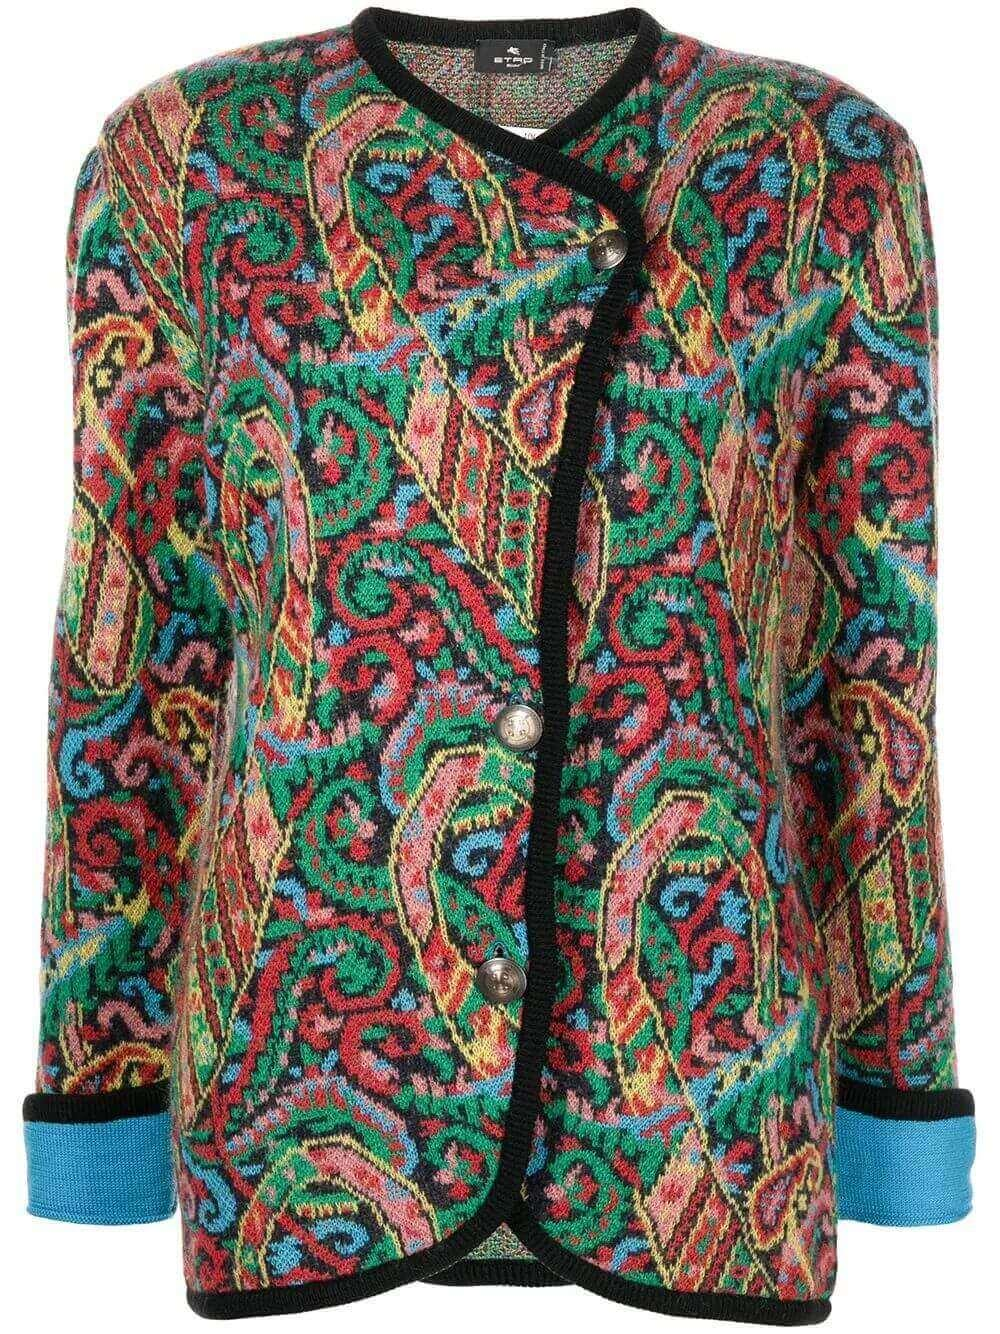 Maglia Giacca Jacket Item # 212D186459144